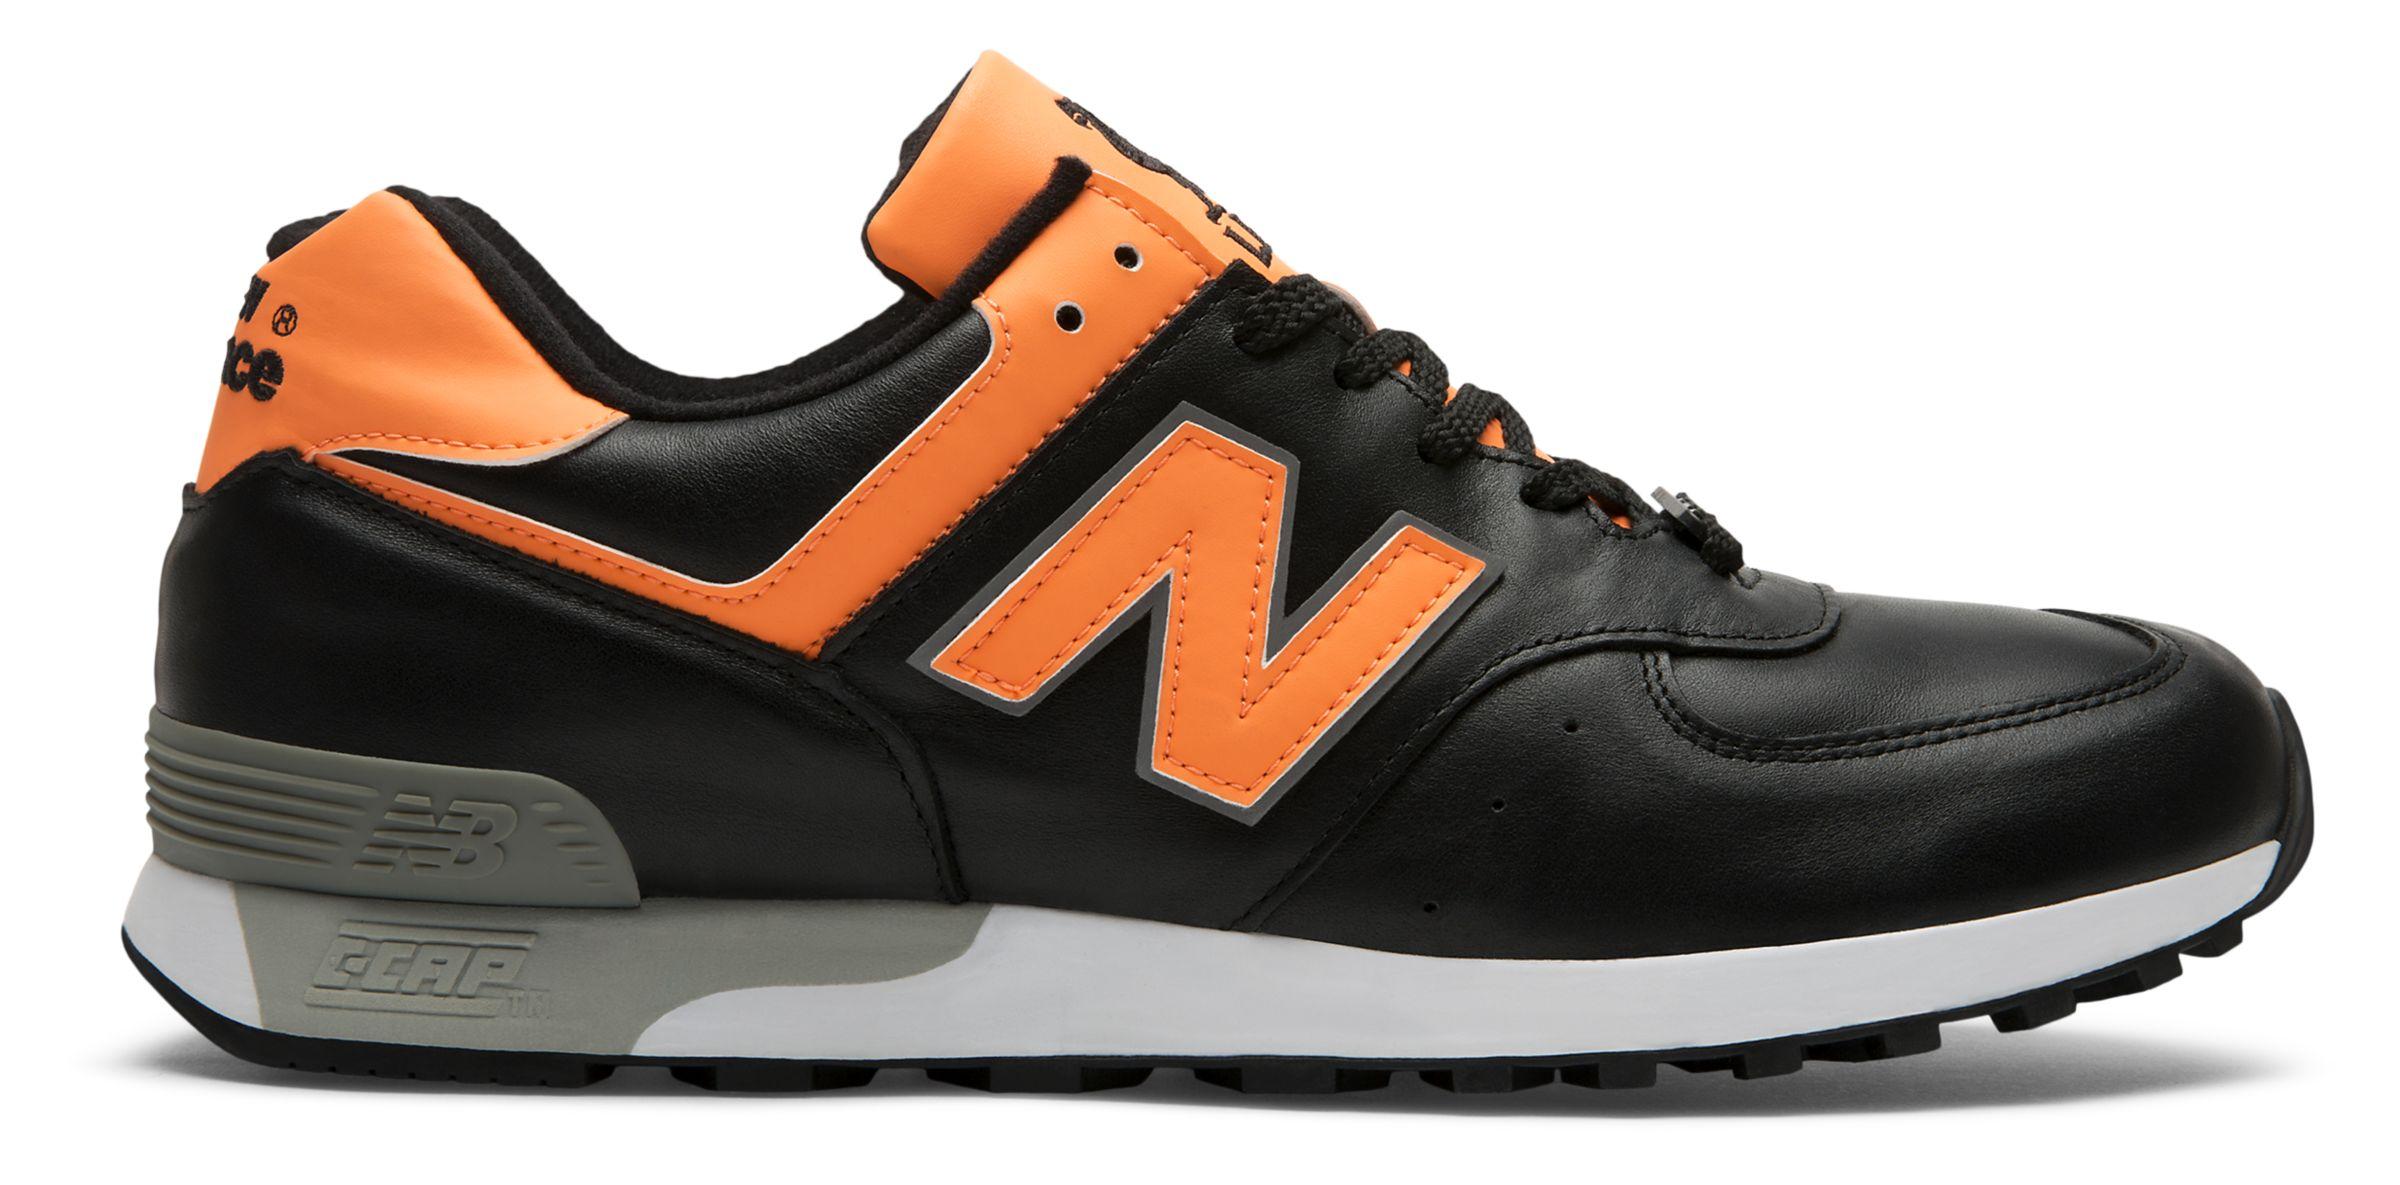 NB 576 Made in UK LFC, Black with Orange & Grey